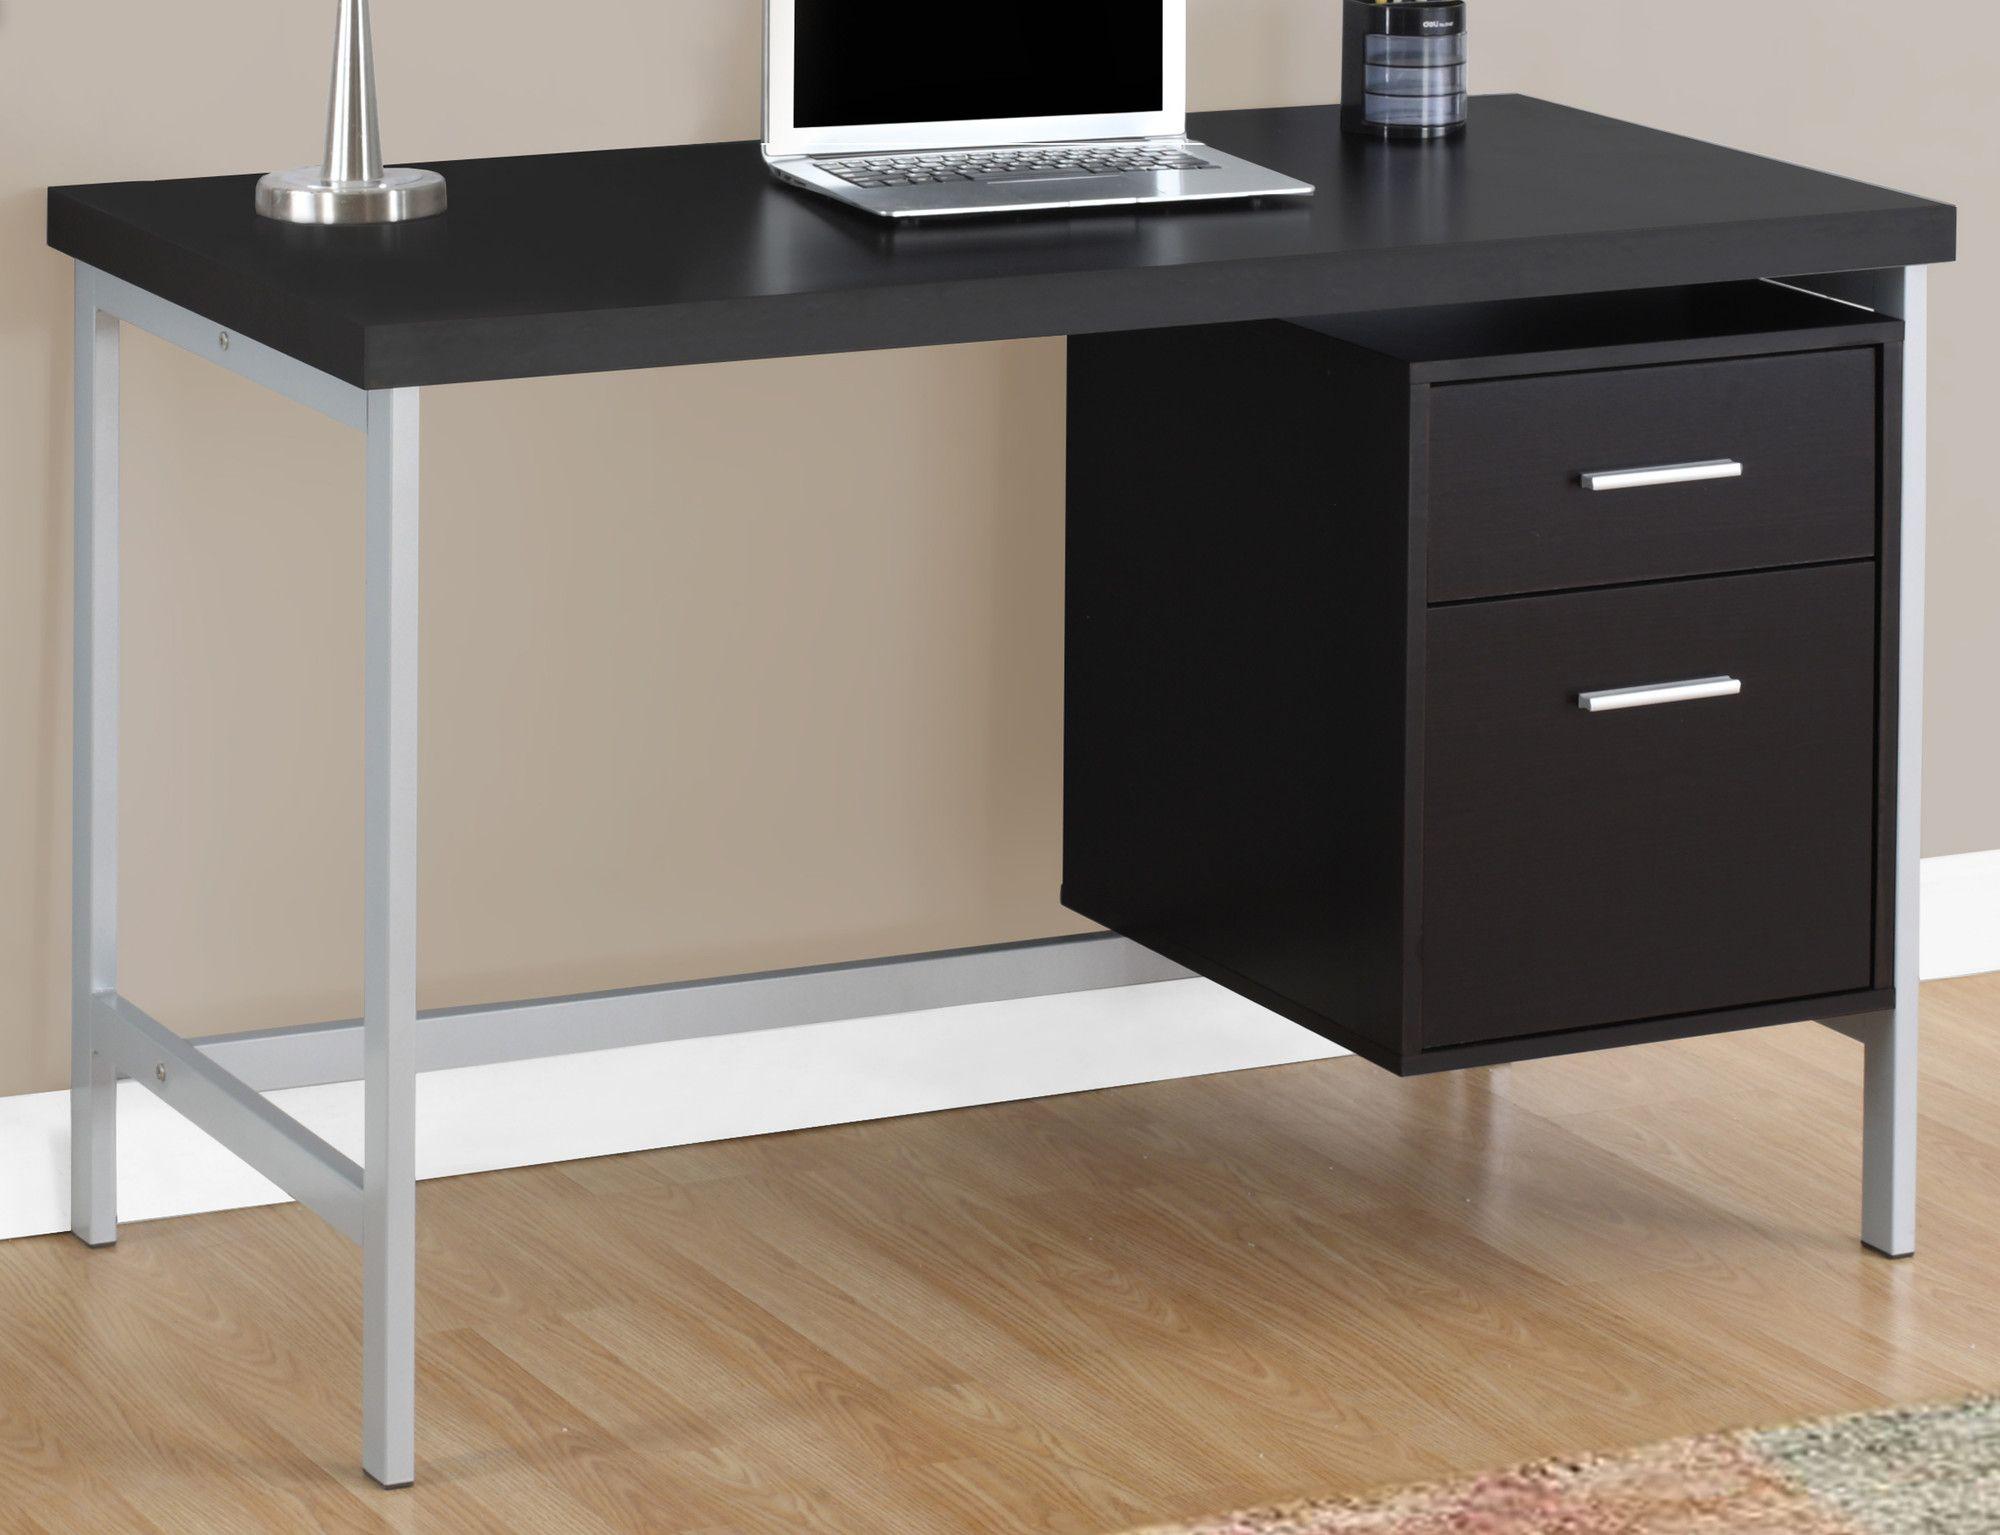 Niles desk in ideas para la casa pinterest desk desk